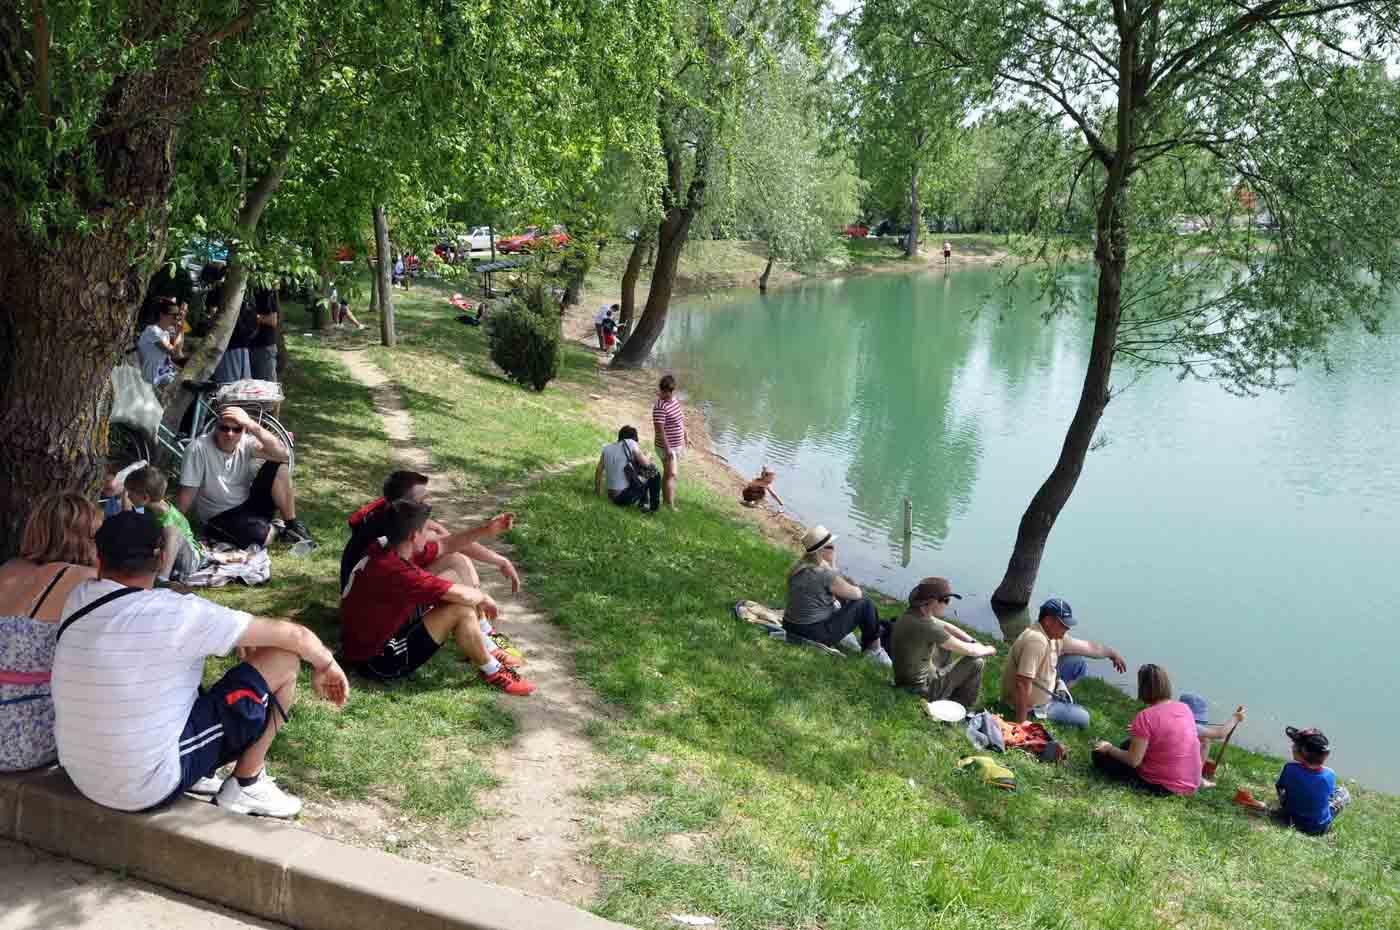 06-zapresic 01 svibanj-piknik-organizator-klub zaprescan-i-gradonacelnik zeljko turk 80